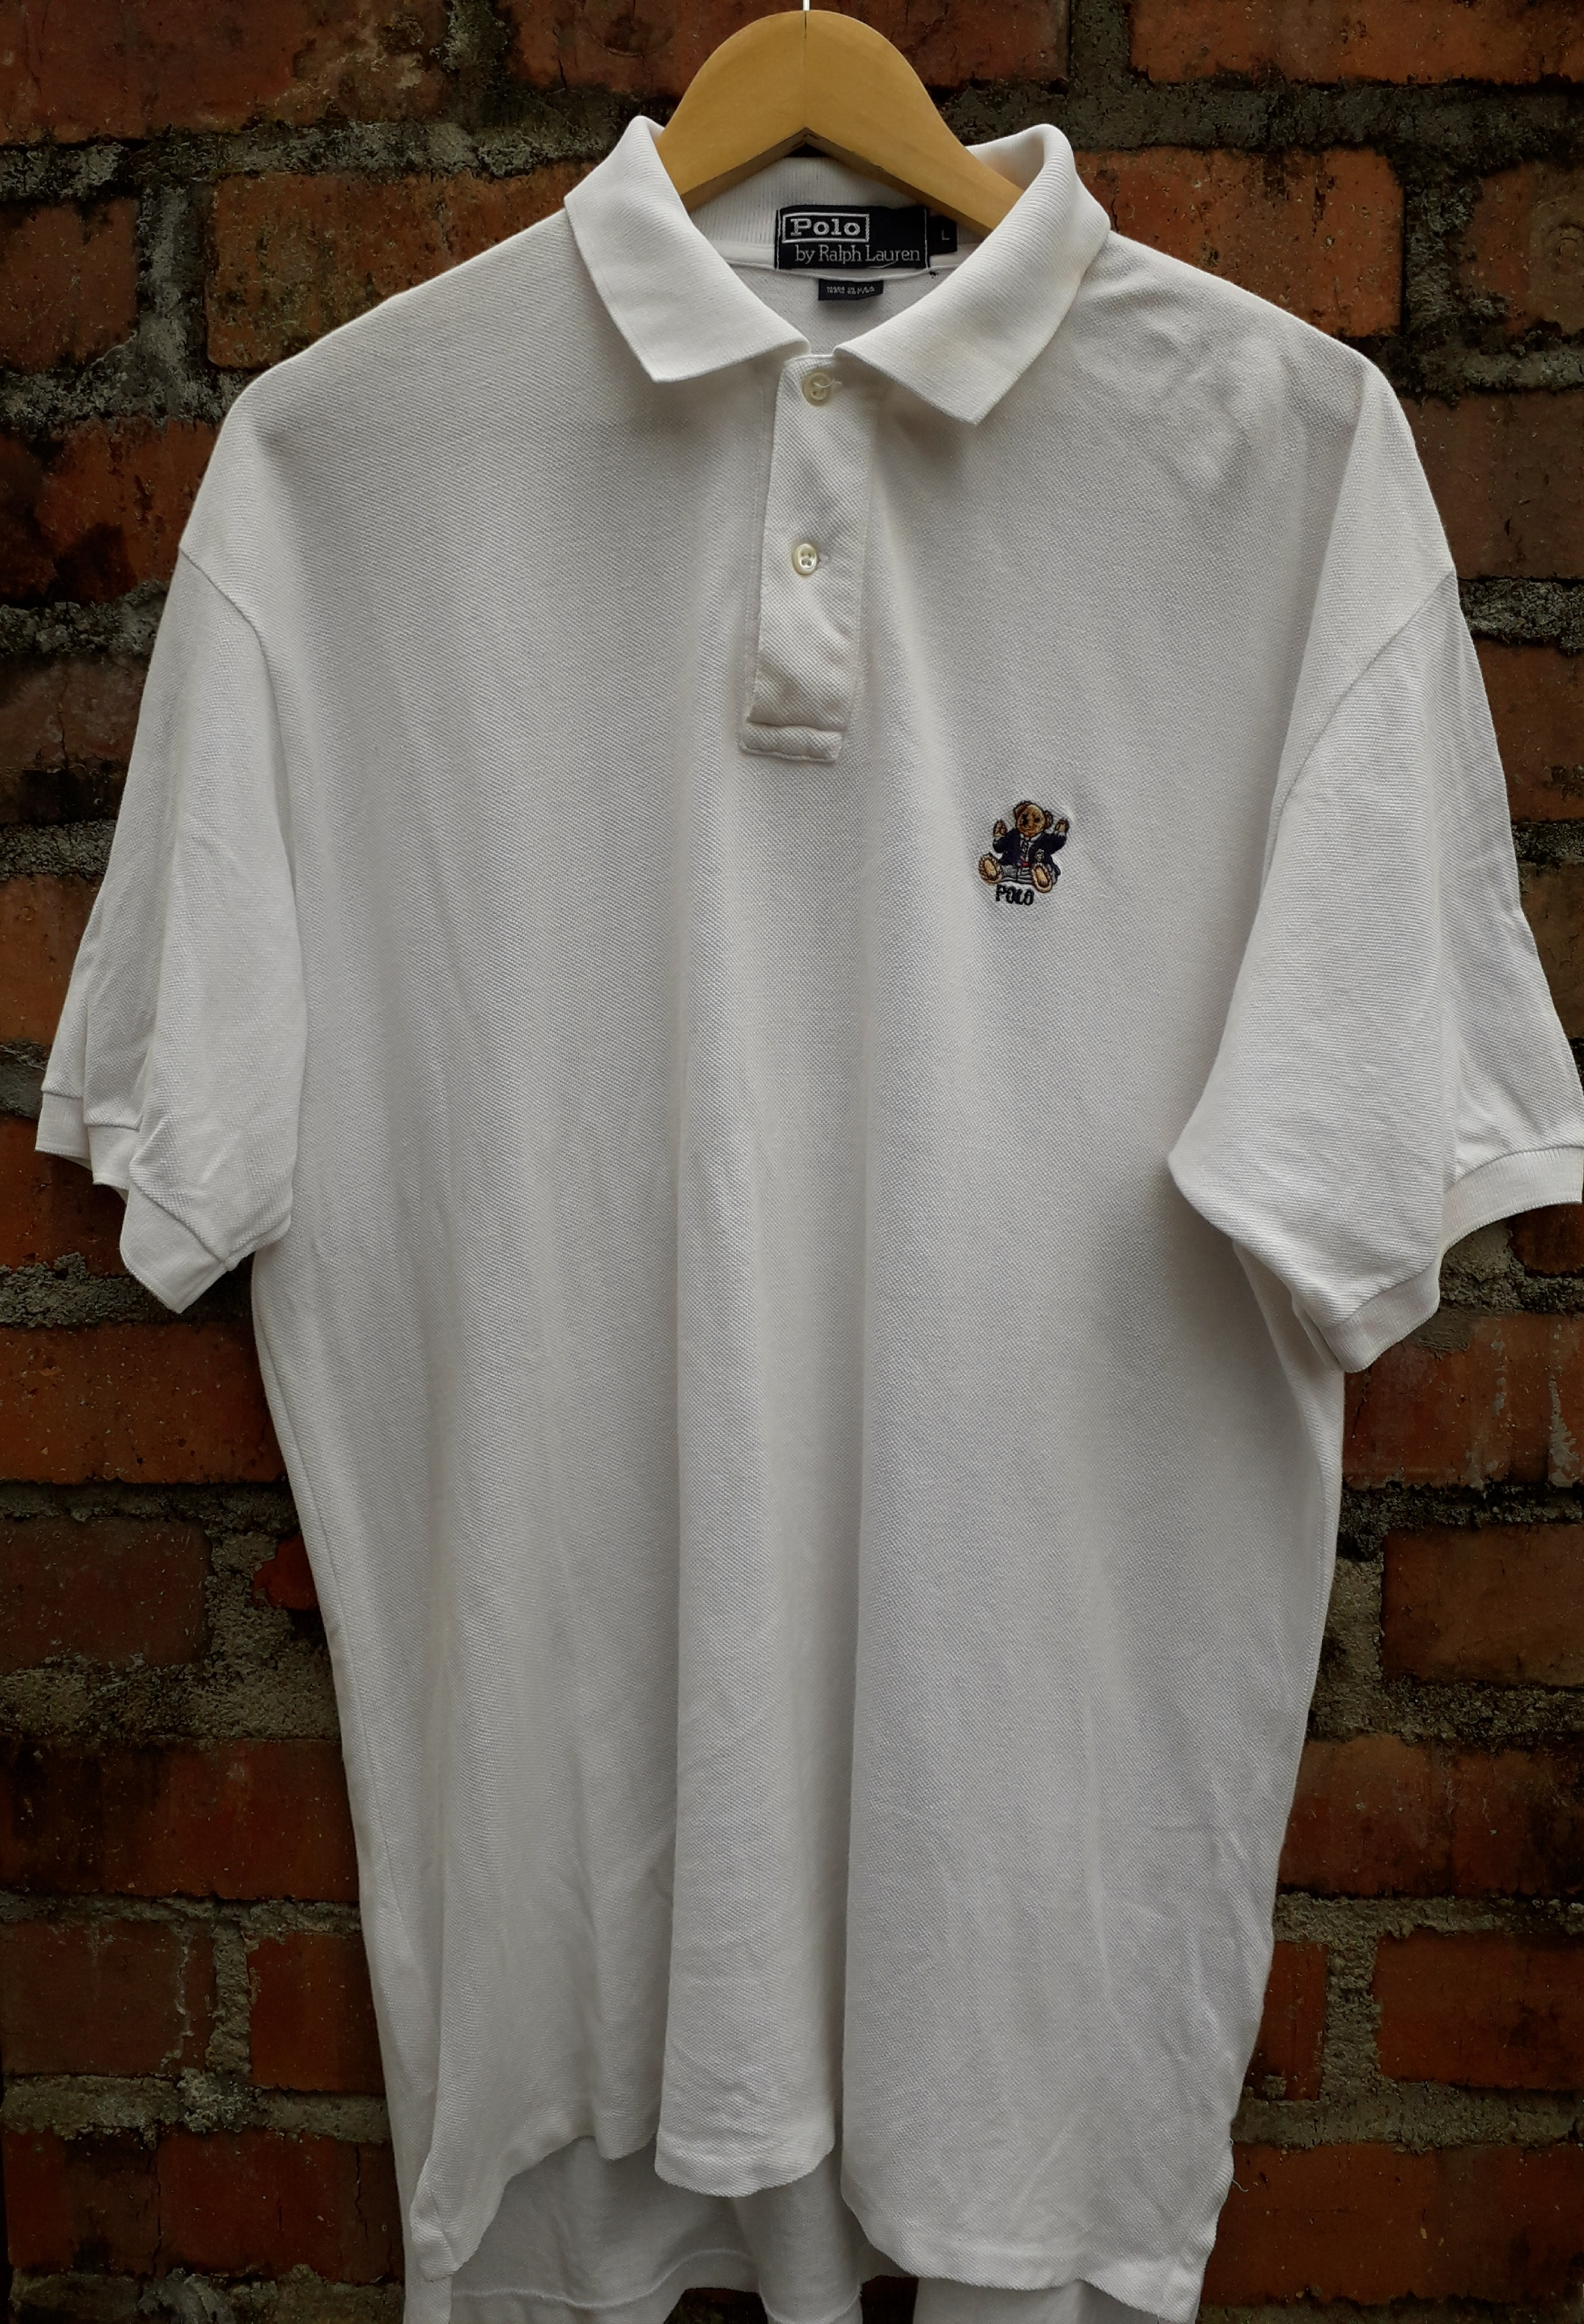 98373fb73 Polo Ralph Lauren ×. Polo Bear Collared Shirt